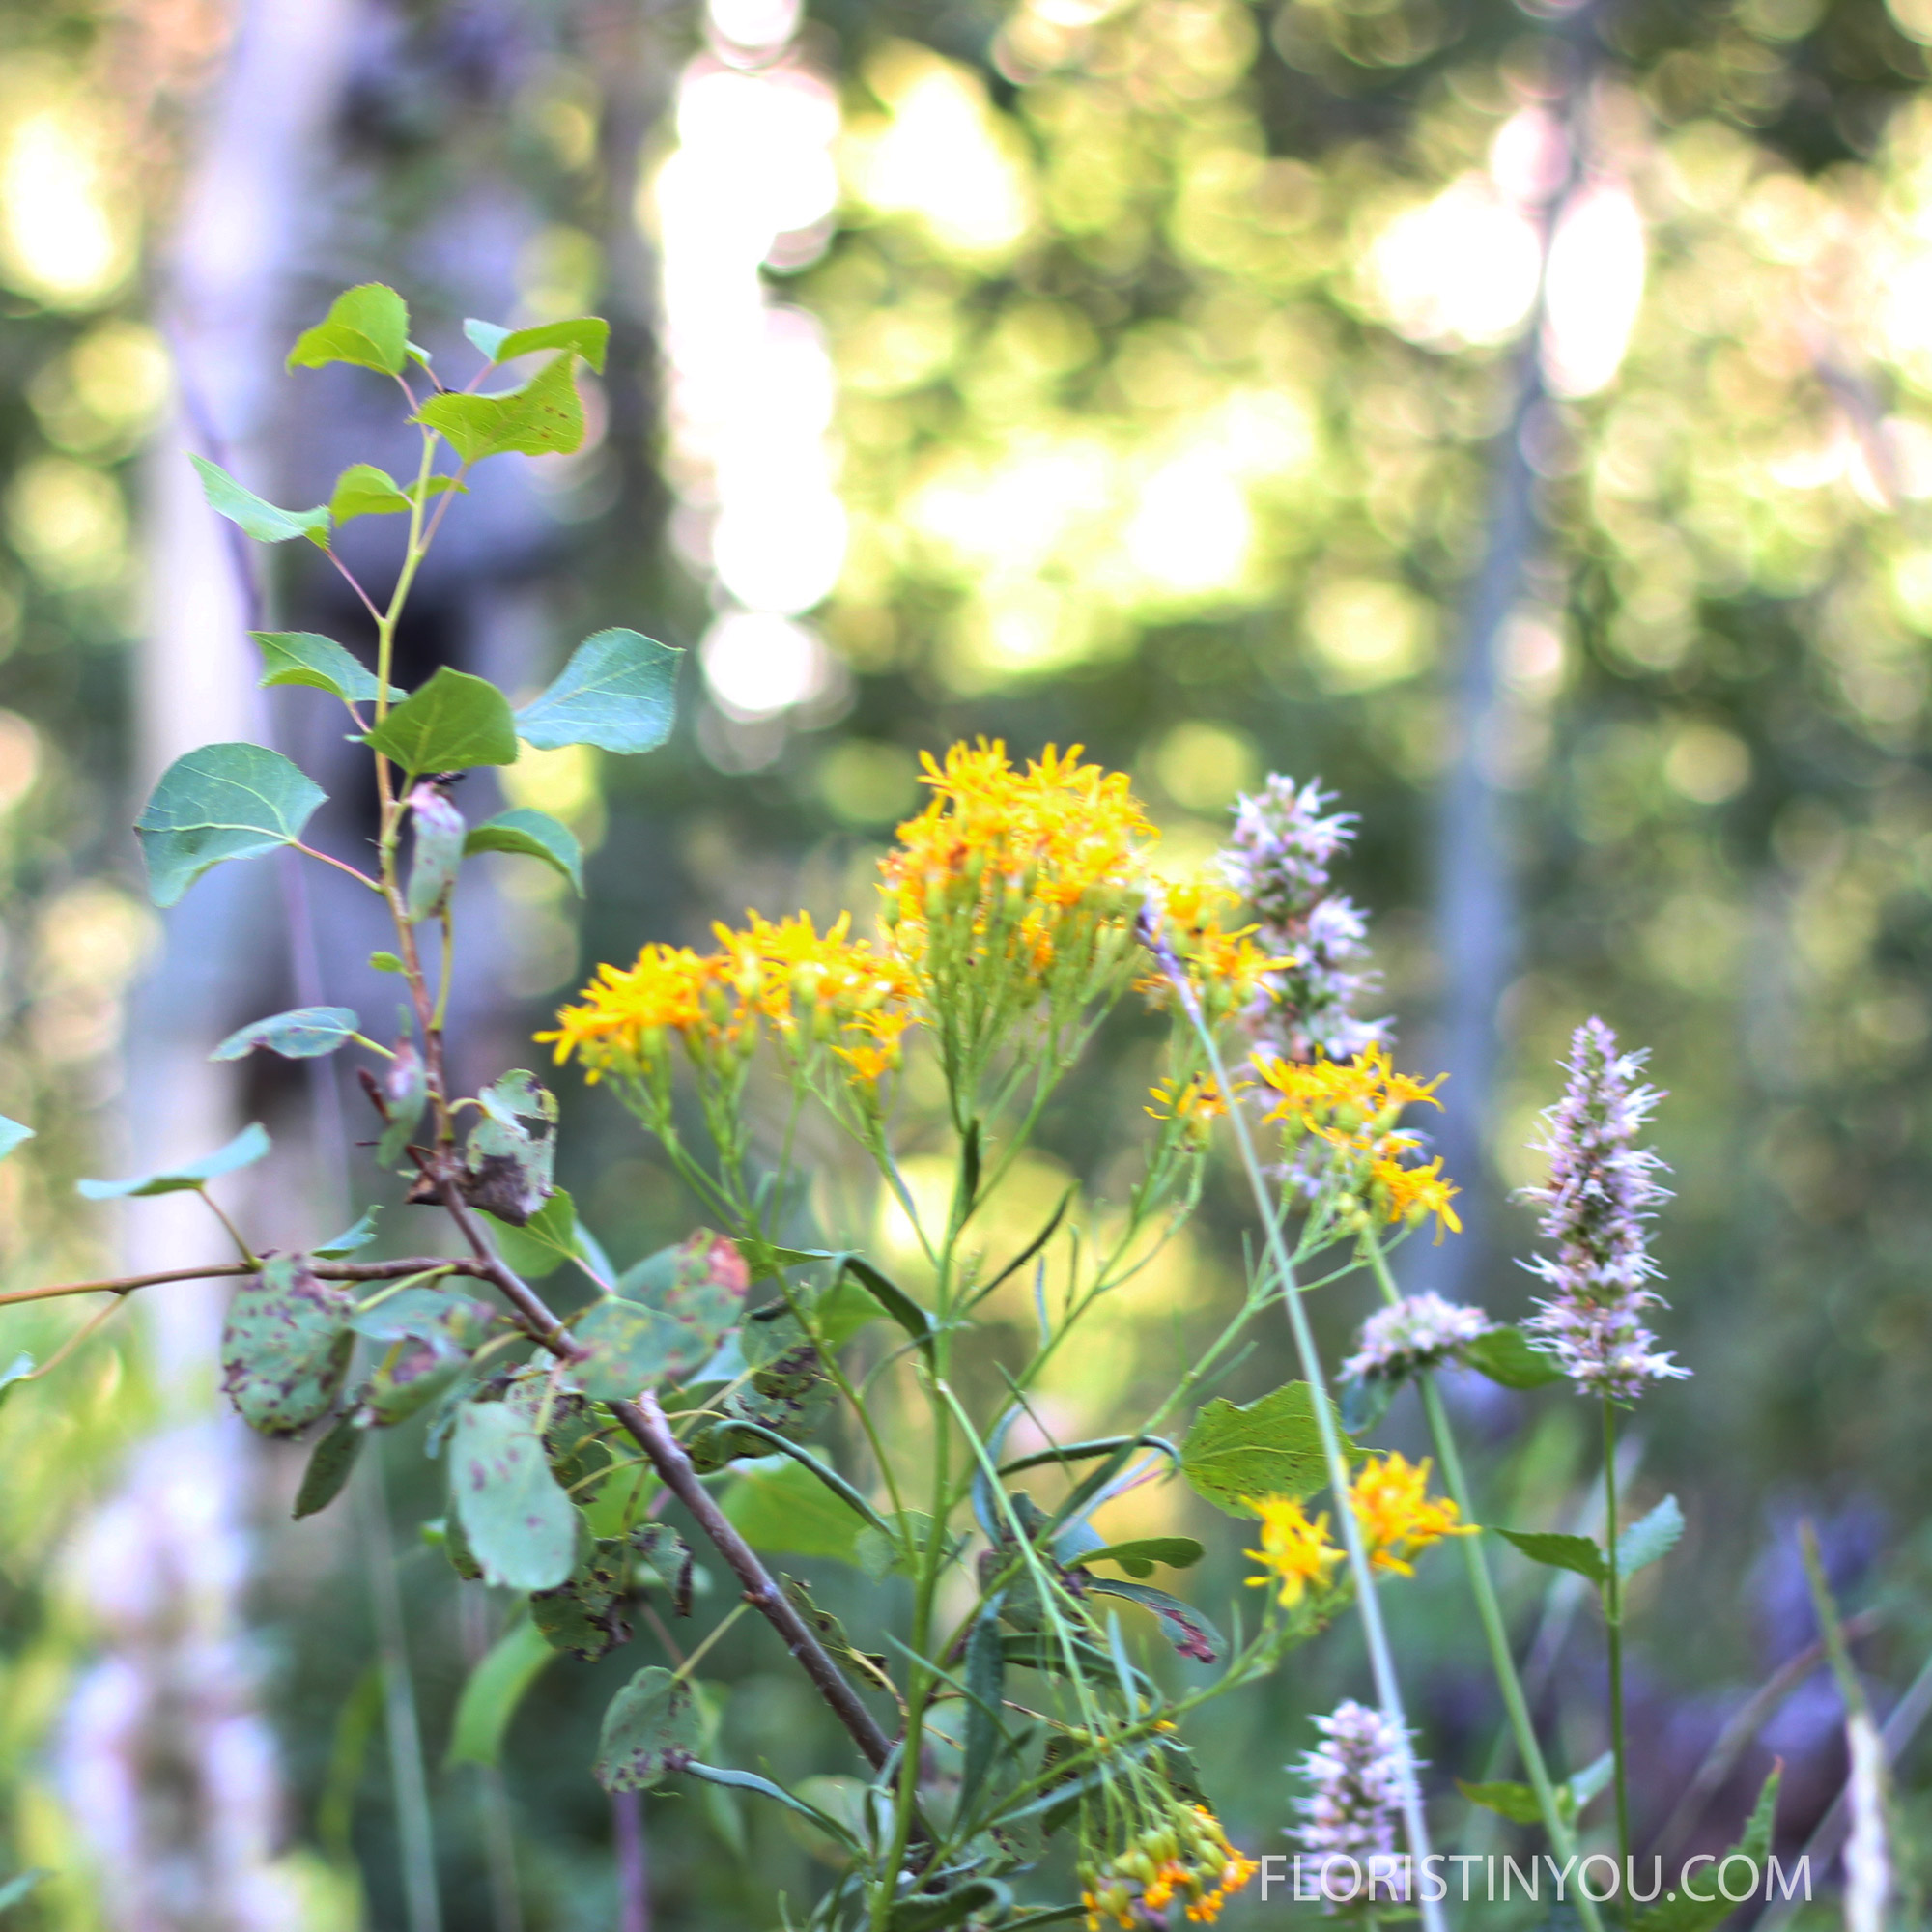 The yellow flowers may be  Saw Groundsel   Senecio serra.